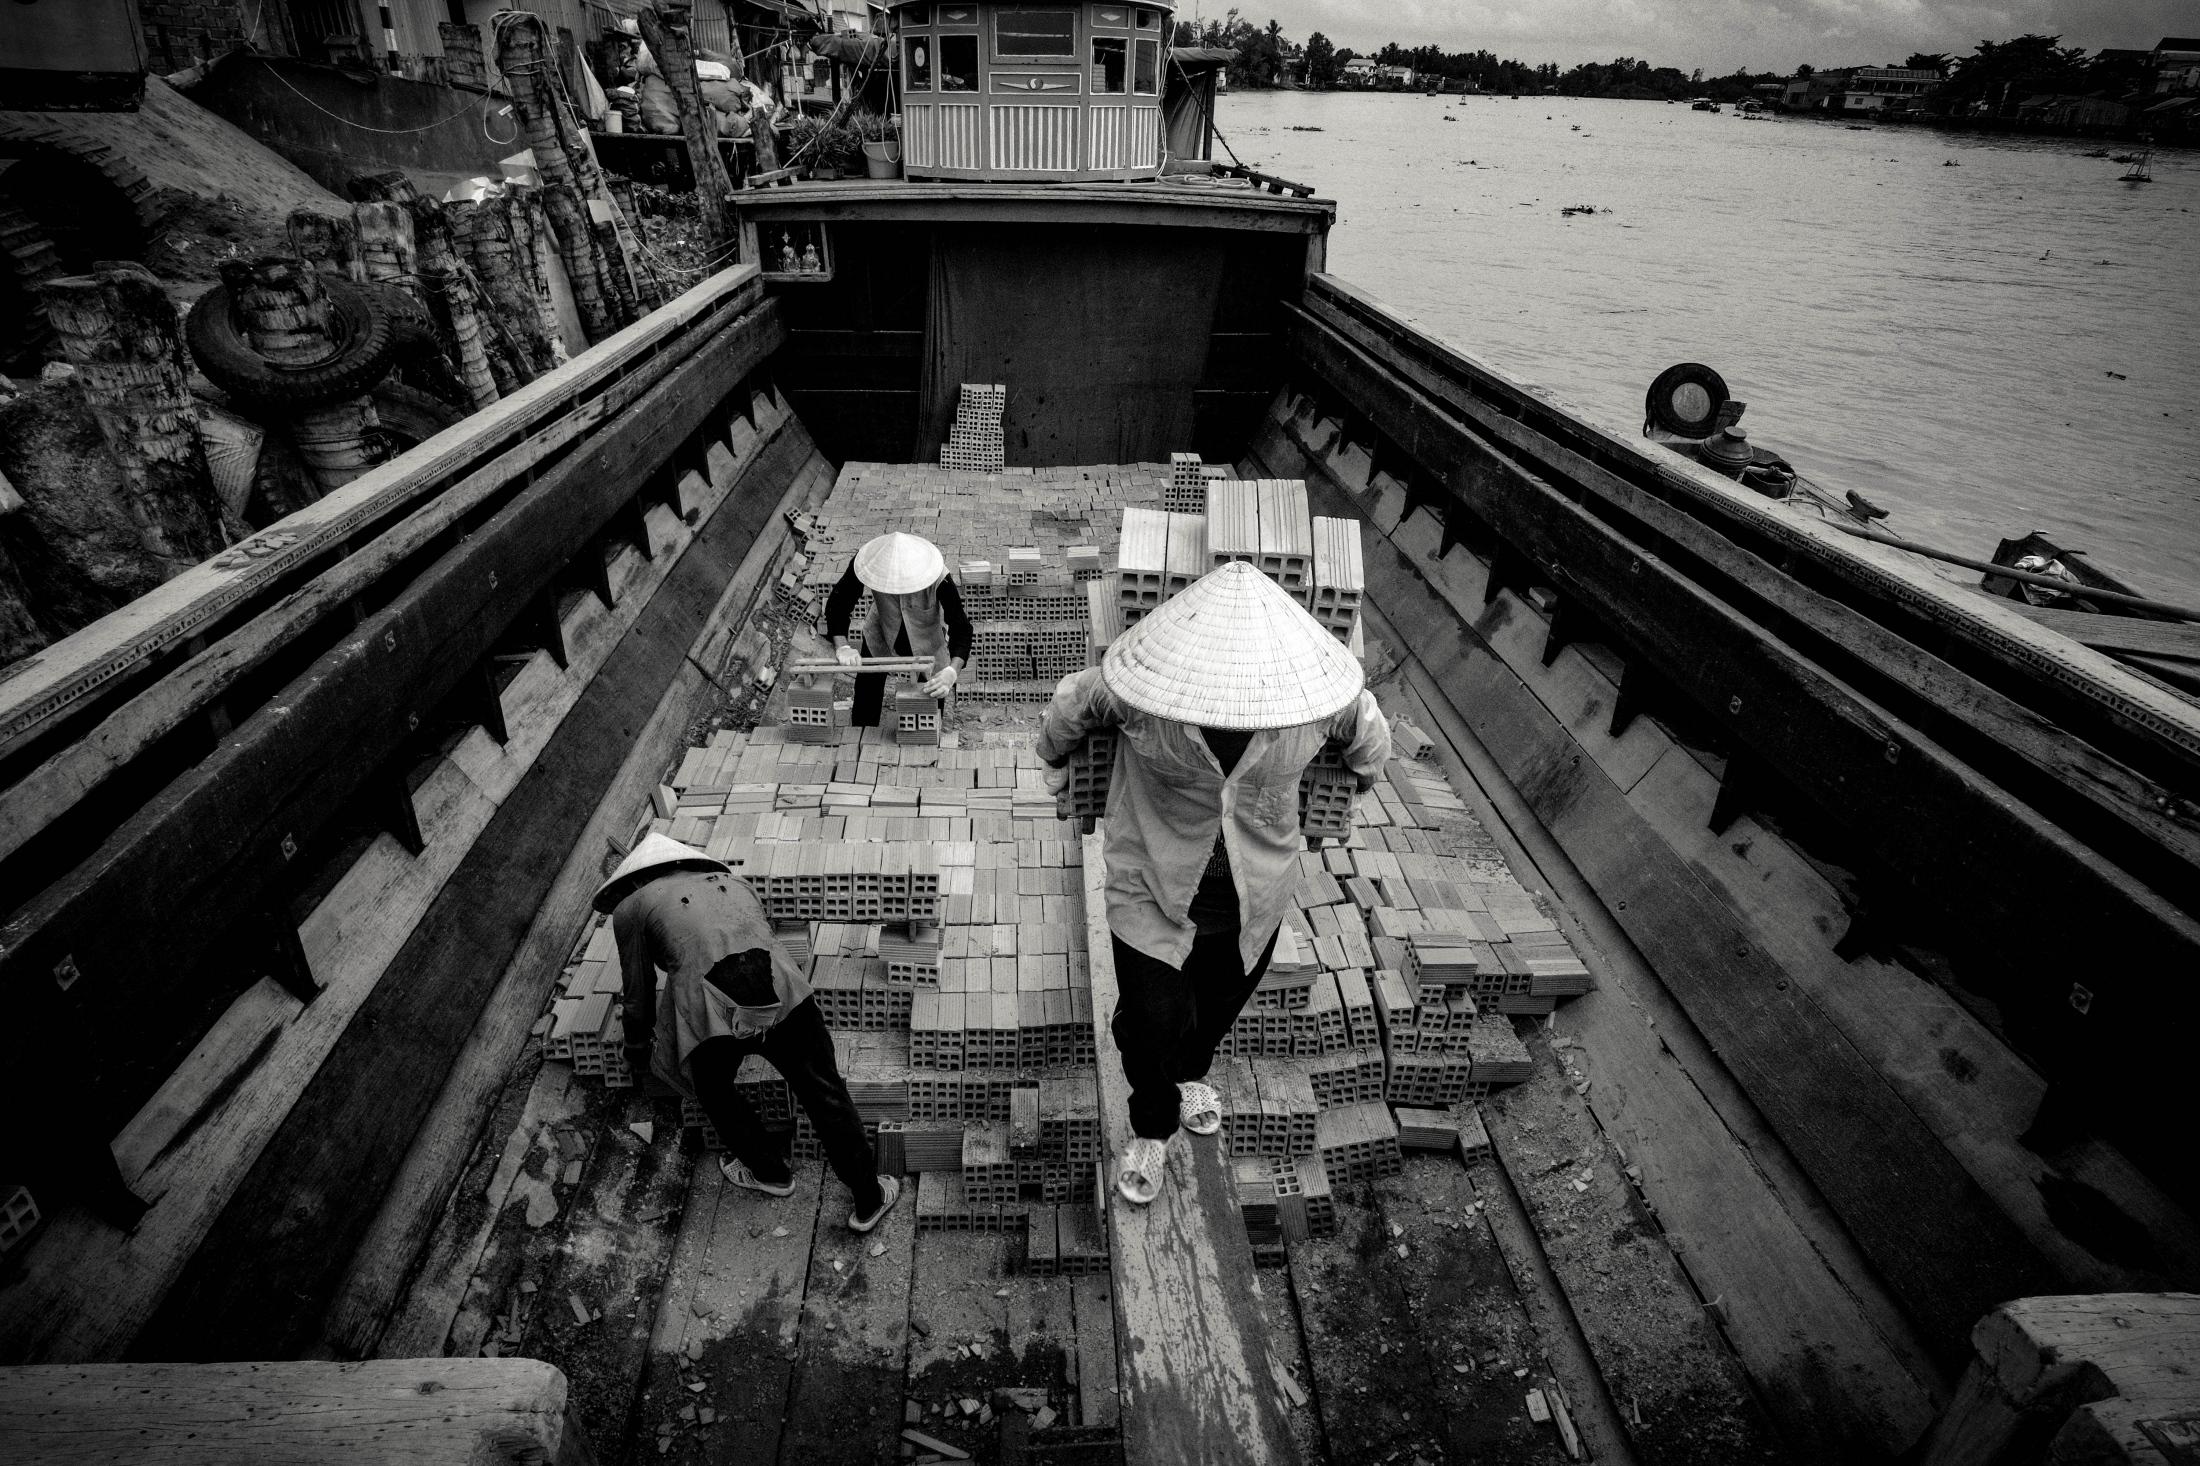 <p>Brick Barge, Can Tho, Mekong...